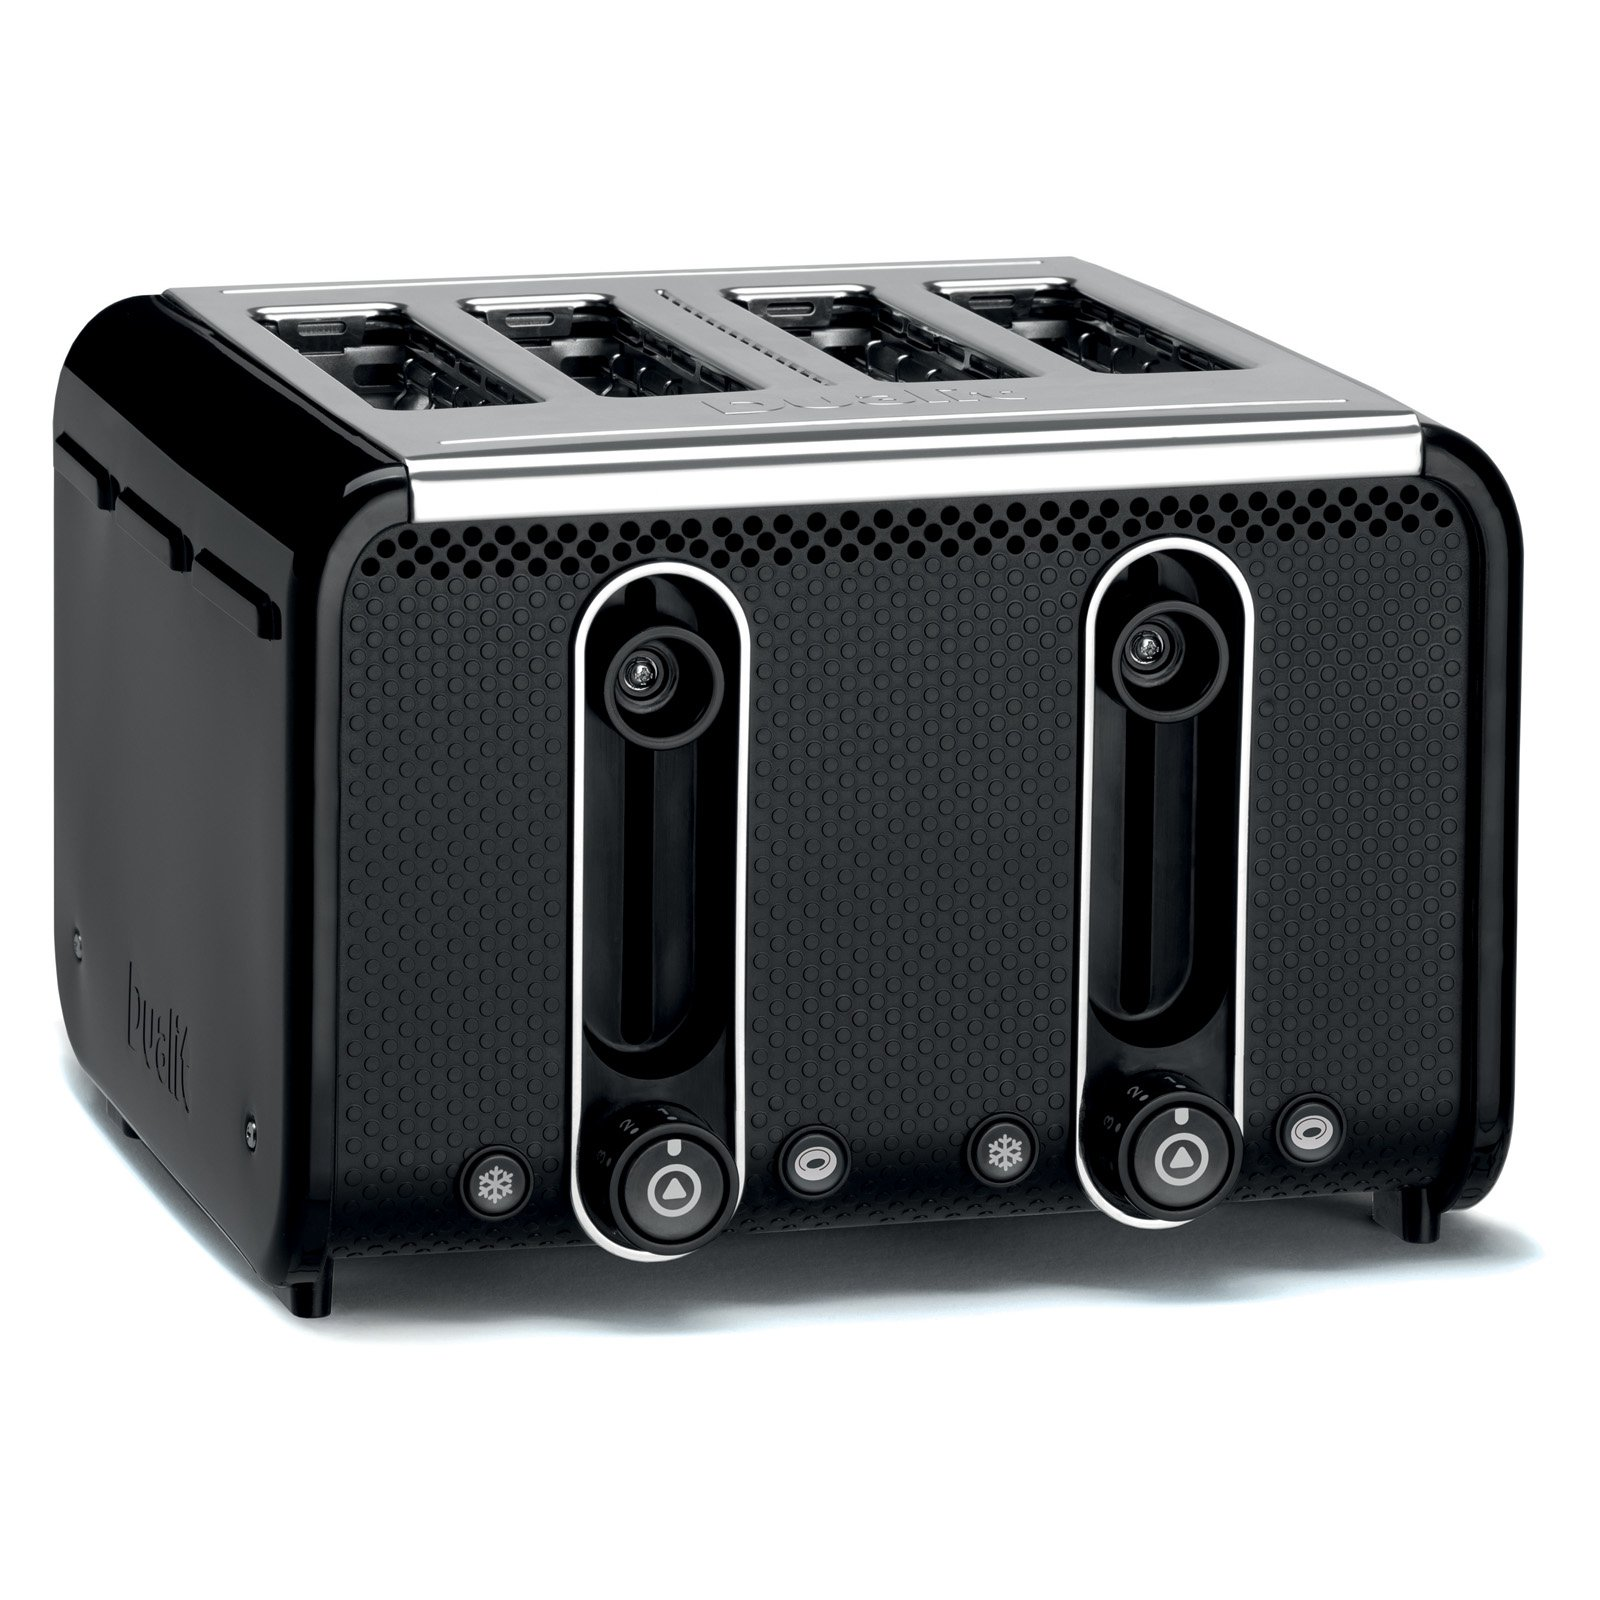 Dualit 46430 4 Slice Toaster - Black/Polished